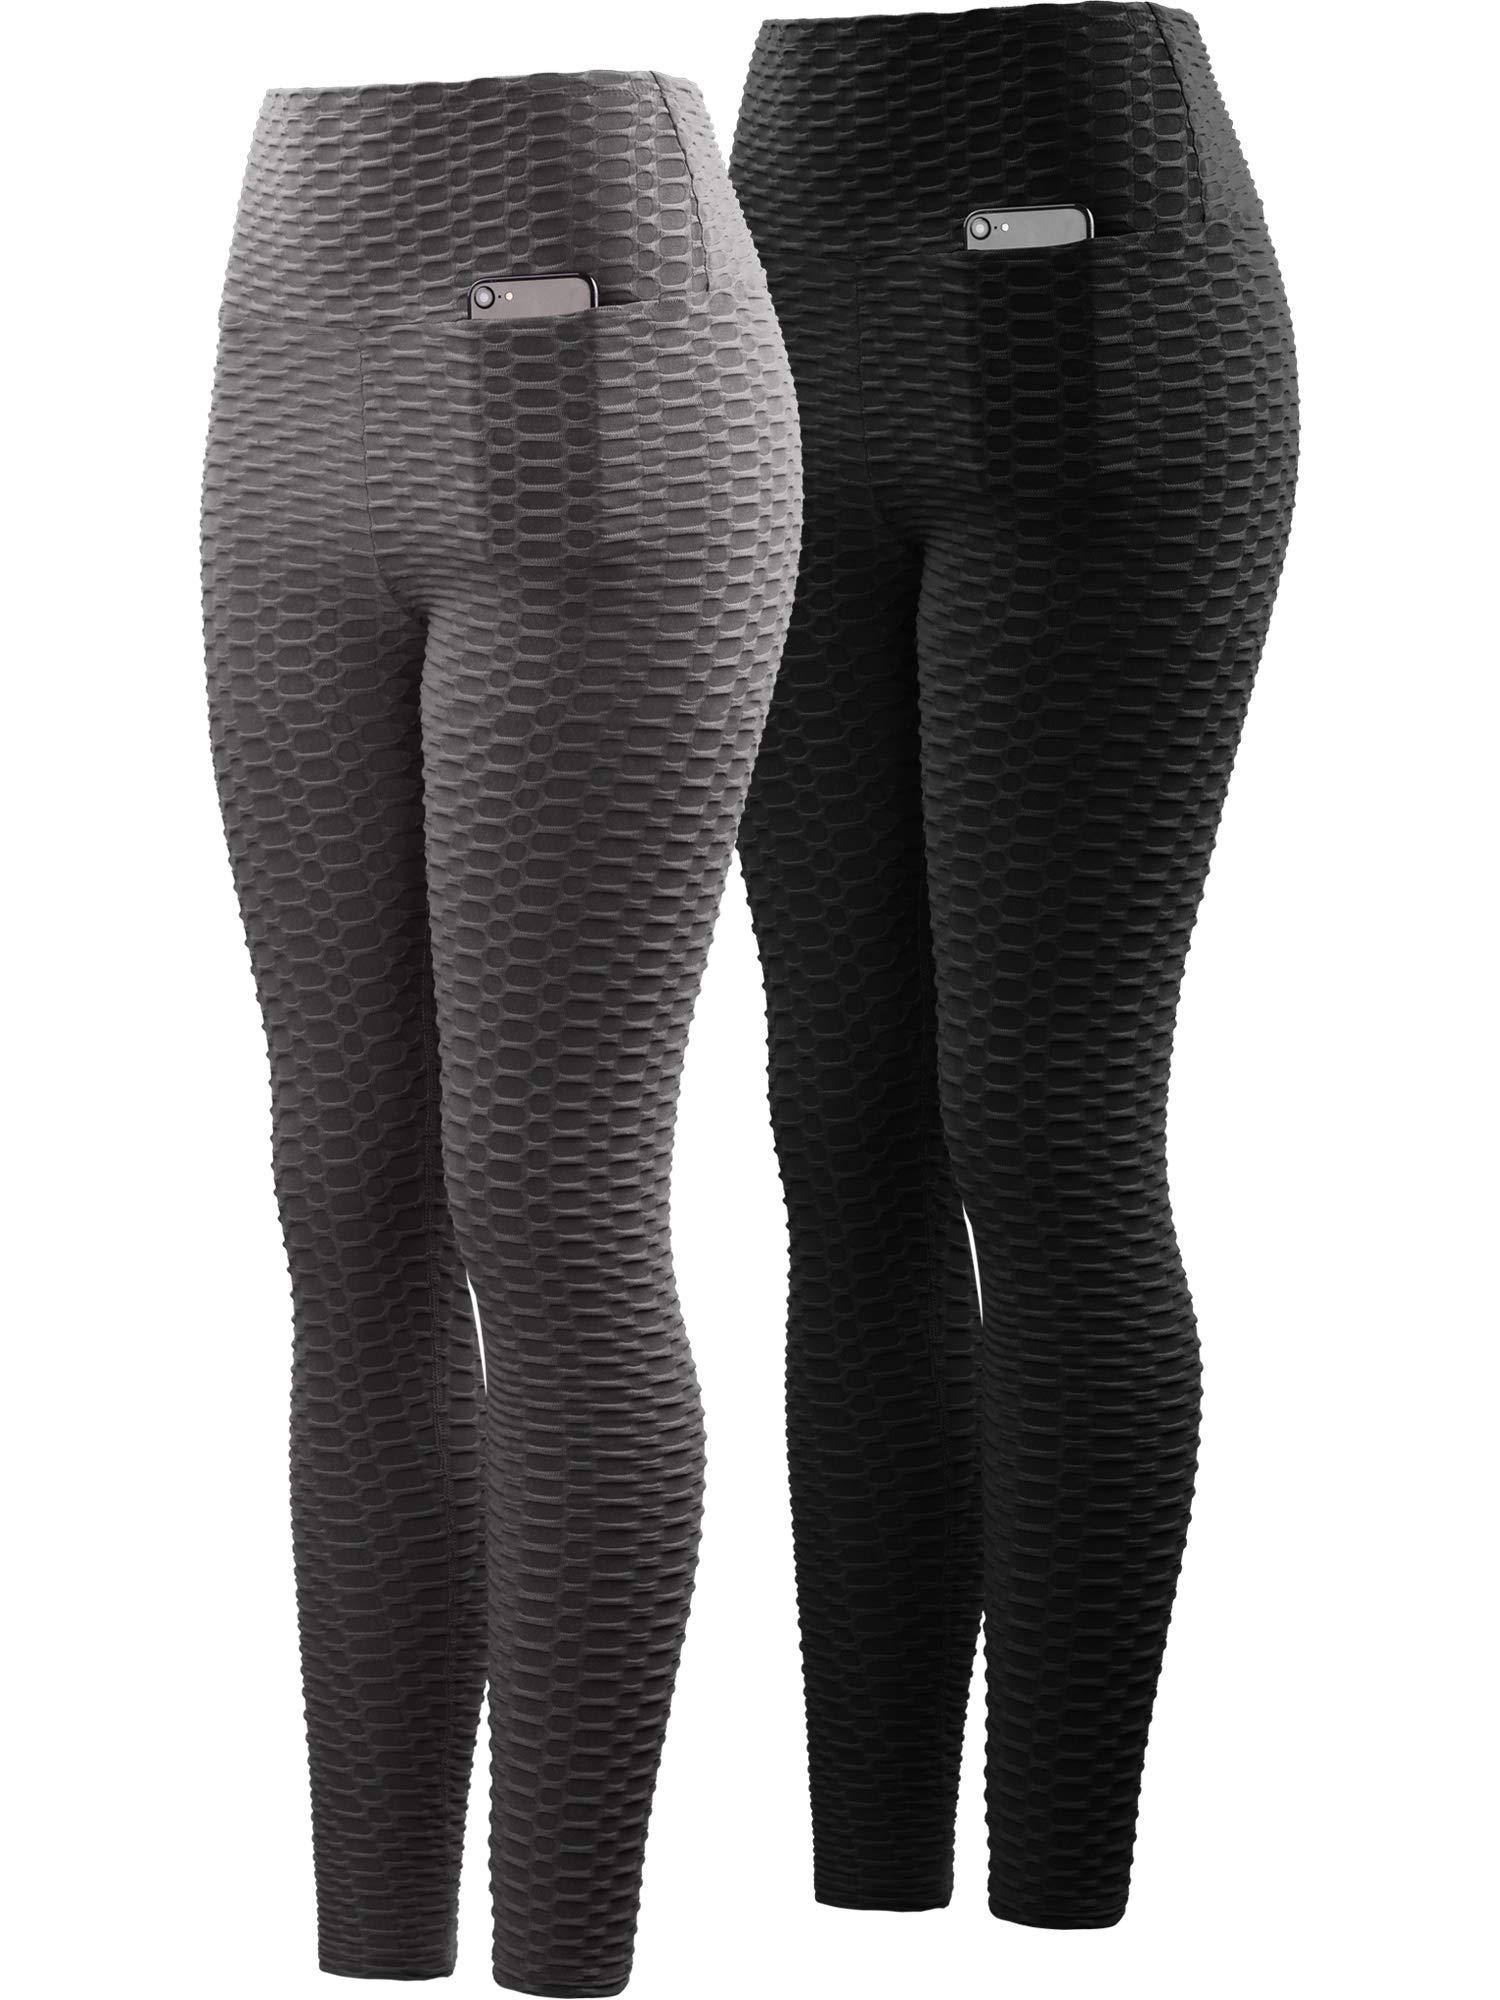 Neleus Women's 2 Pack Tummy Control High Waist Leggings Out Pocket,9036,Black/Grey,S,EU M